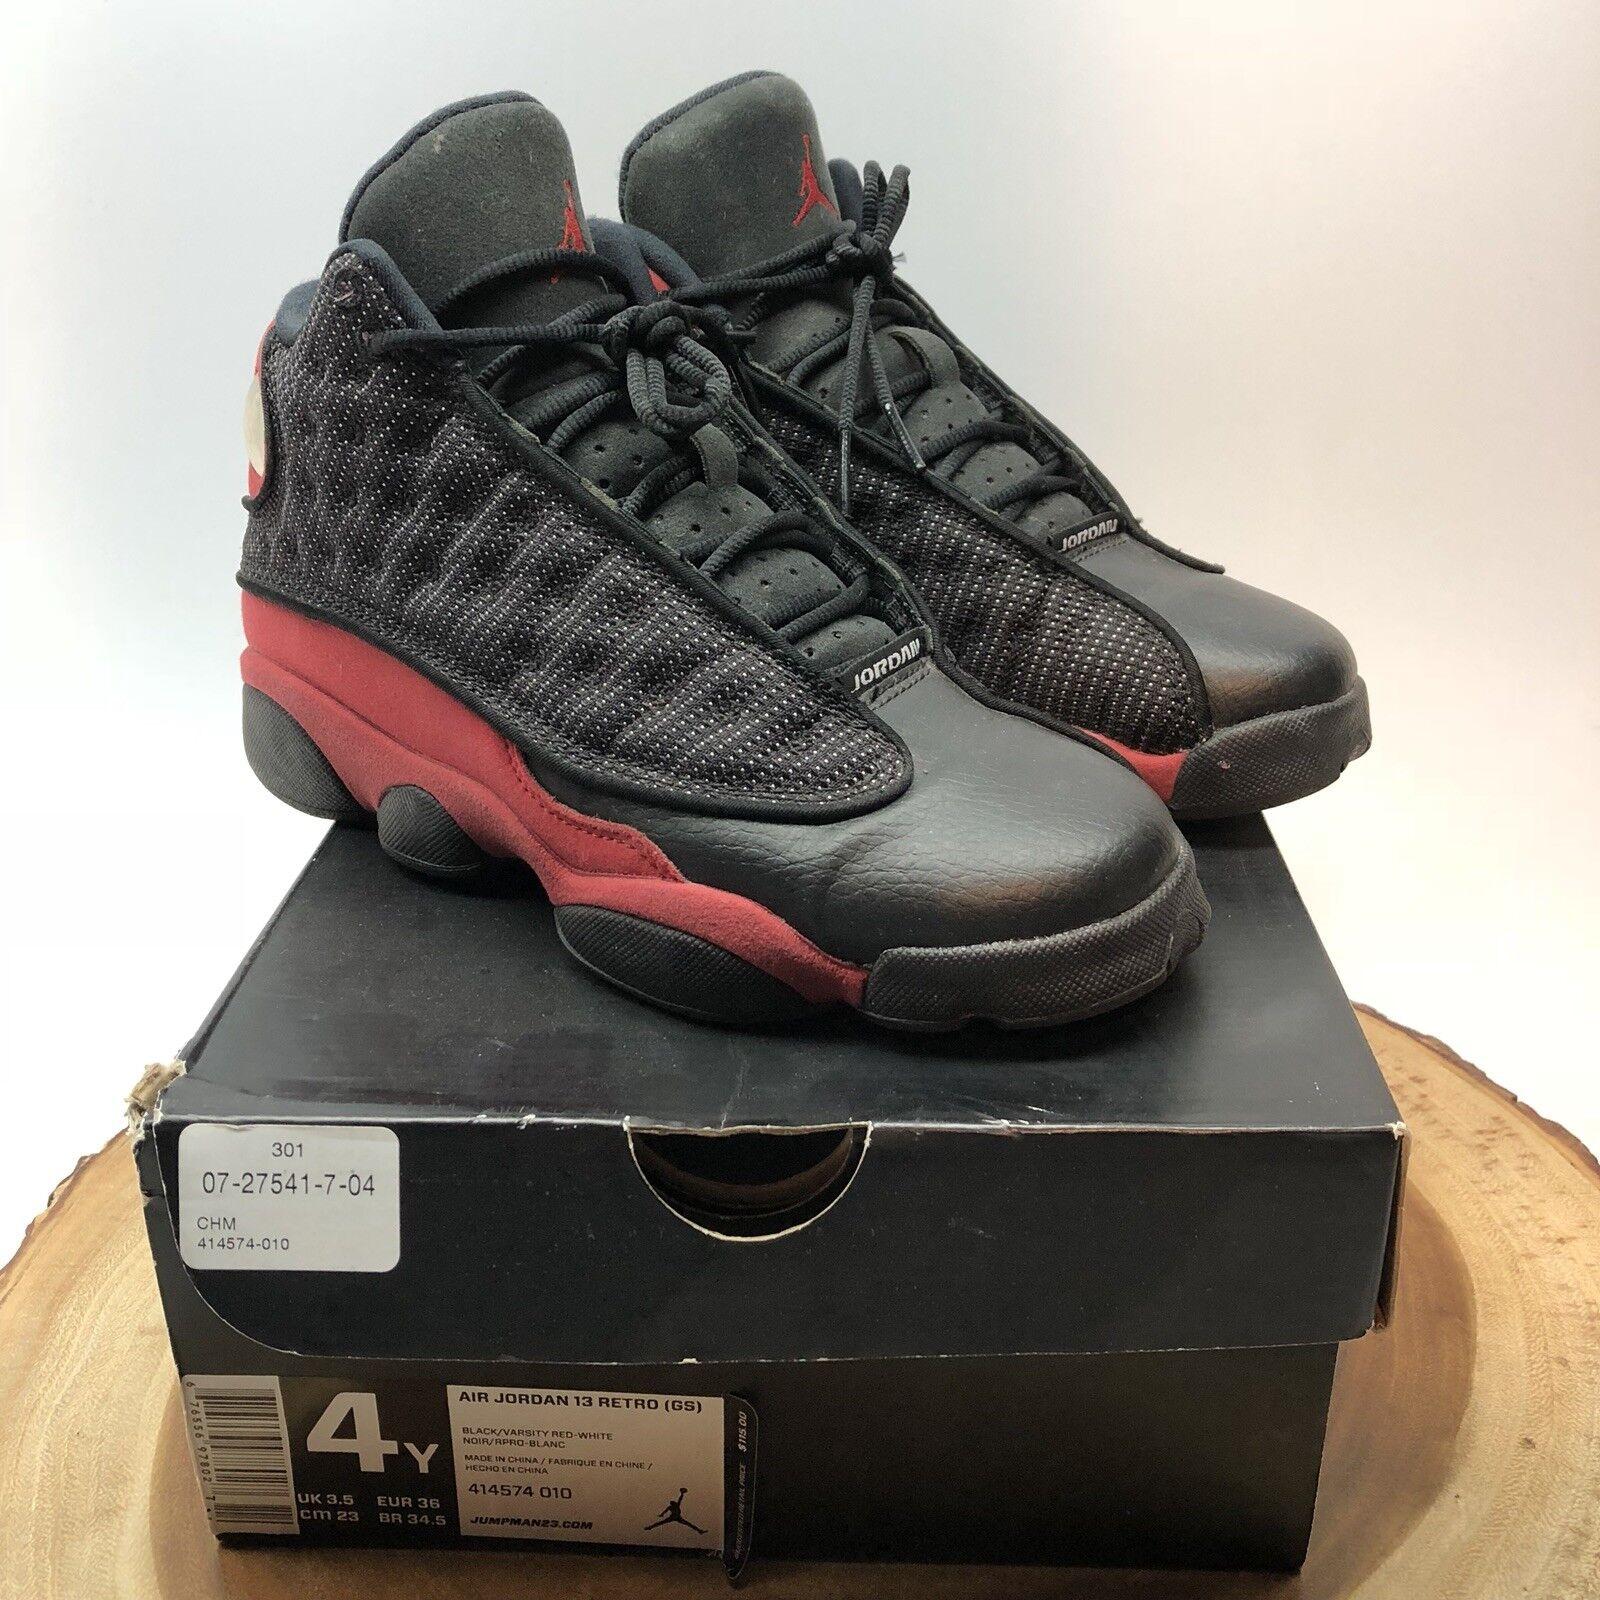 Nike Air Jordan Retro XIII Bred Size 4y He Got Game Altitude Playoff XI XIV IX